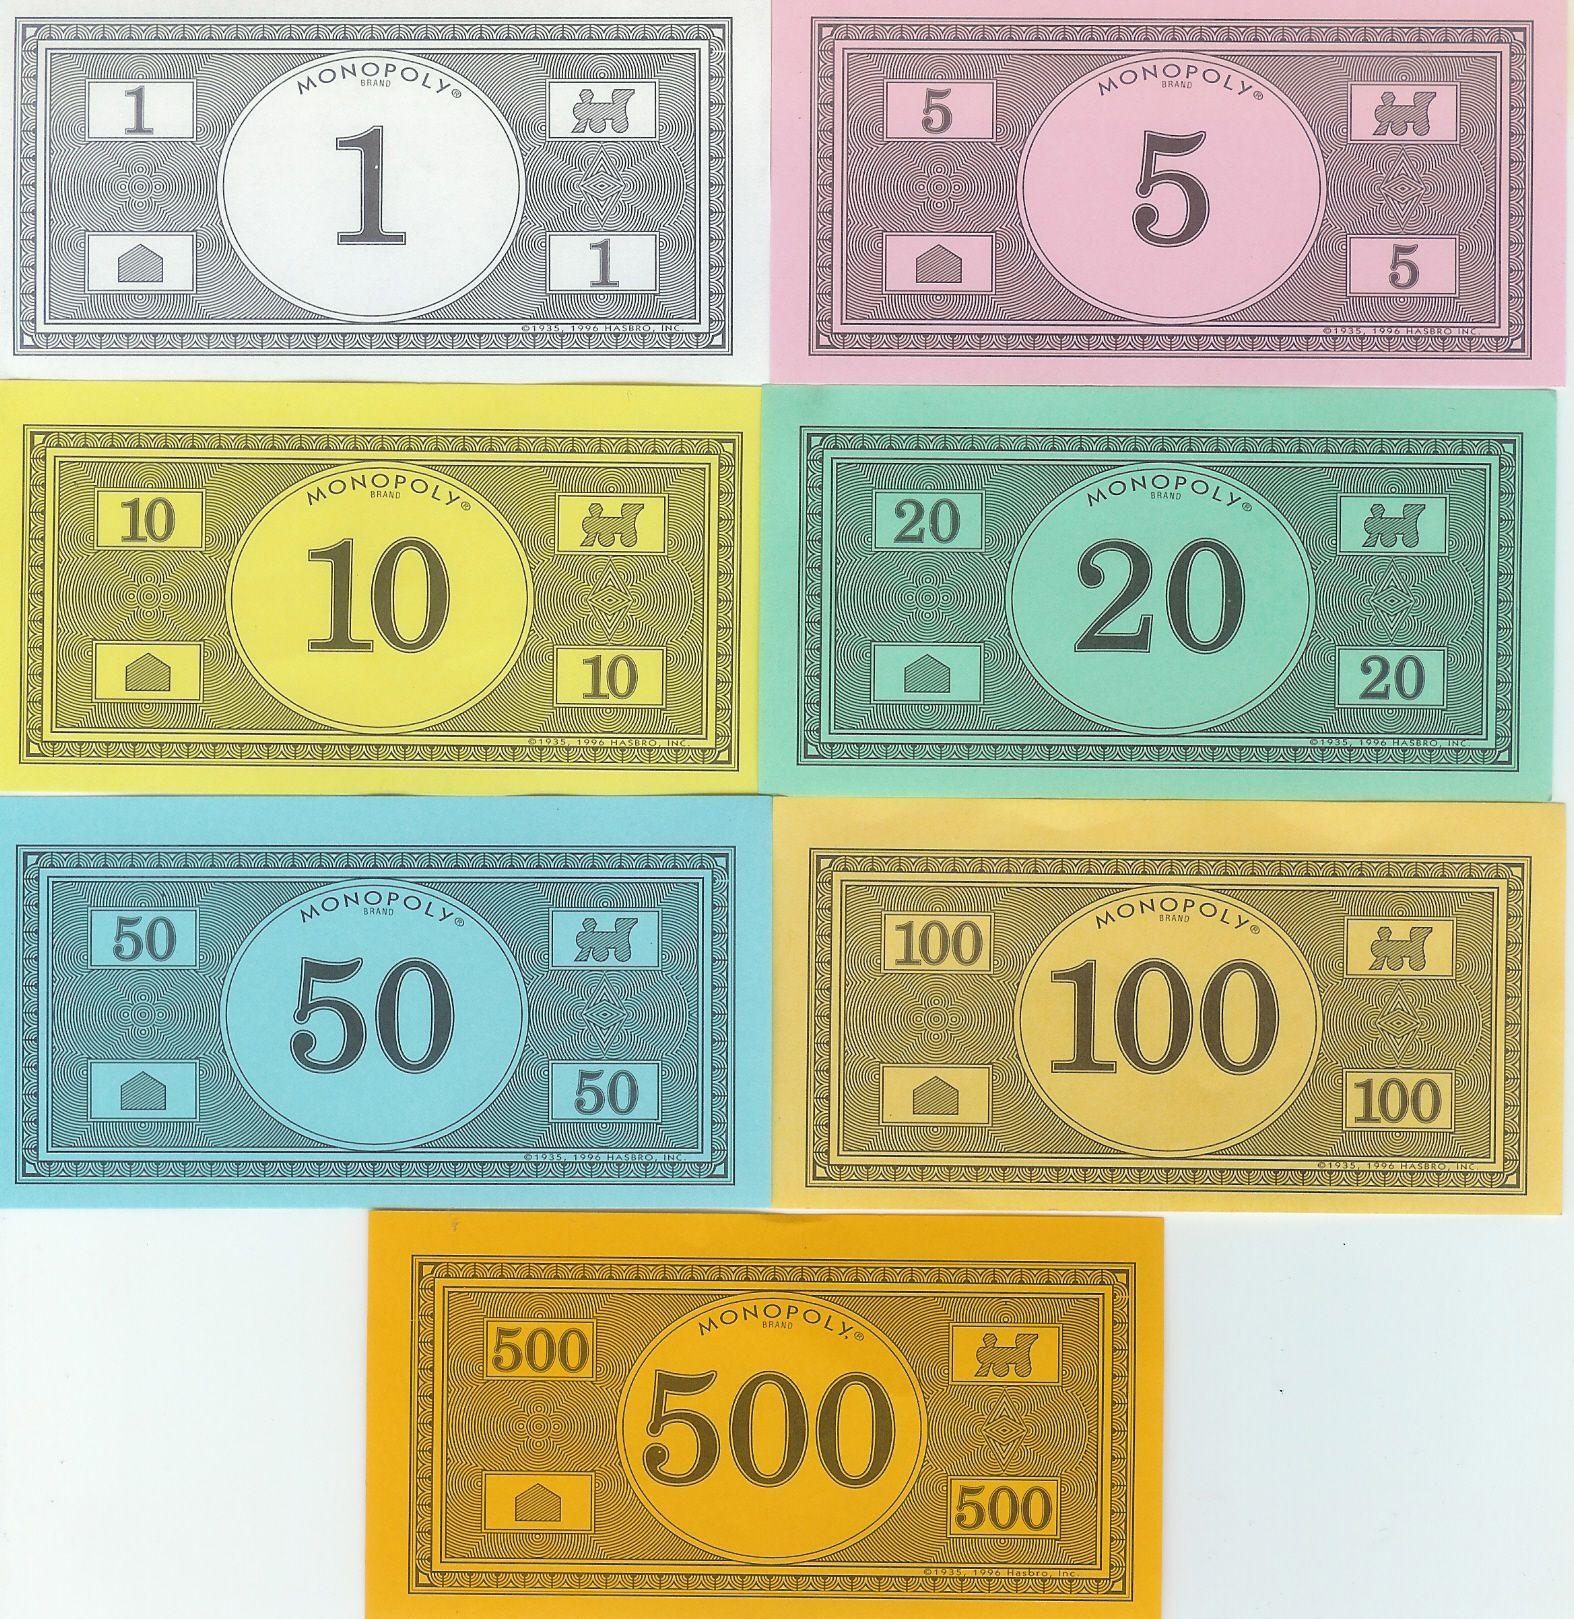 monopoly money templates free invitation templates library ideas